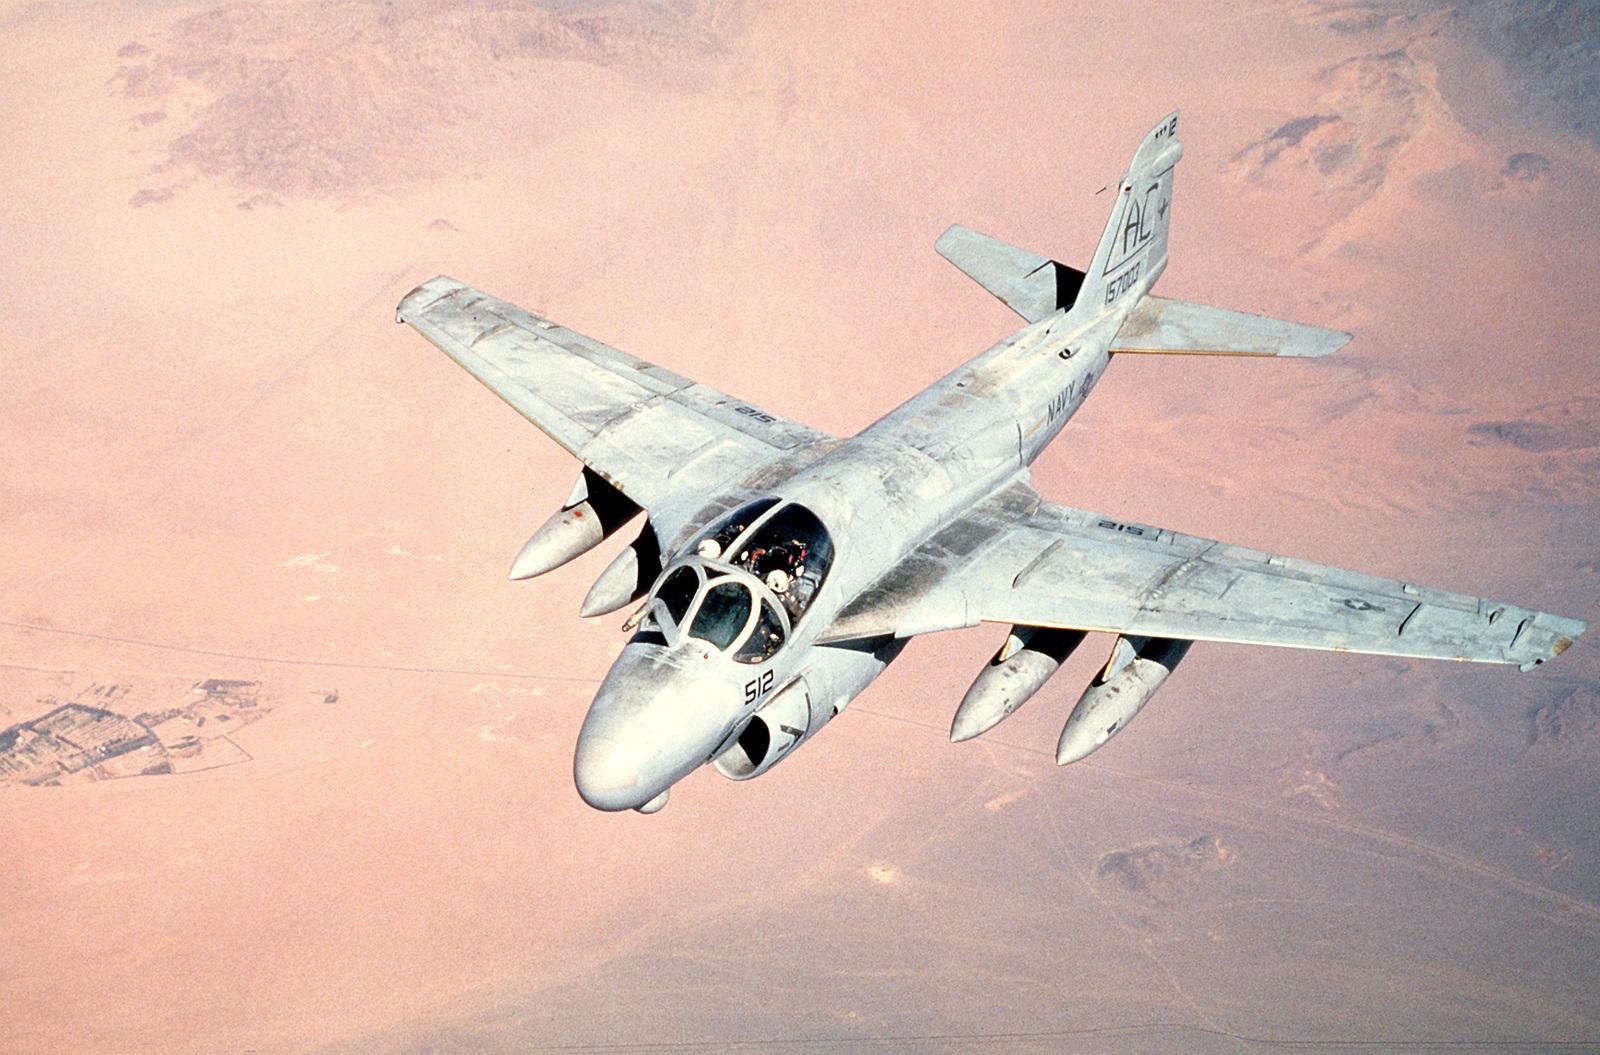 An A-6E Intruder aircraft flies over the desert as it prepares for refueling during Operation Desert Storm.